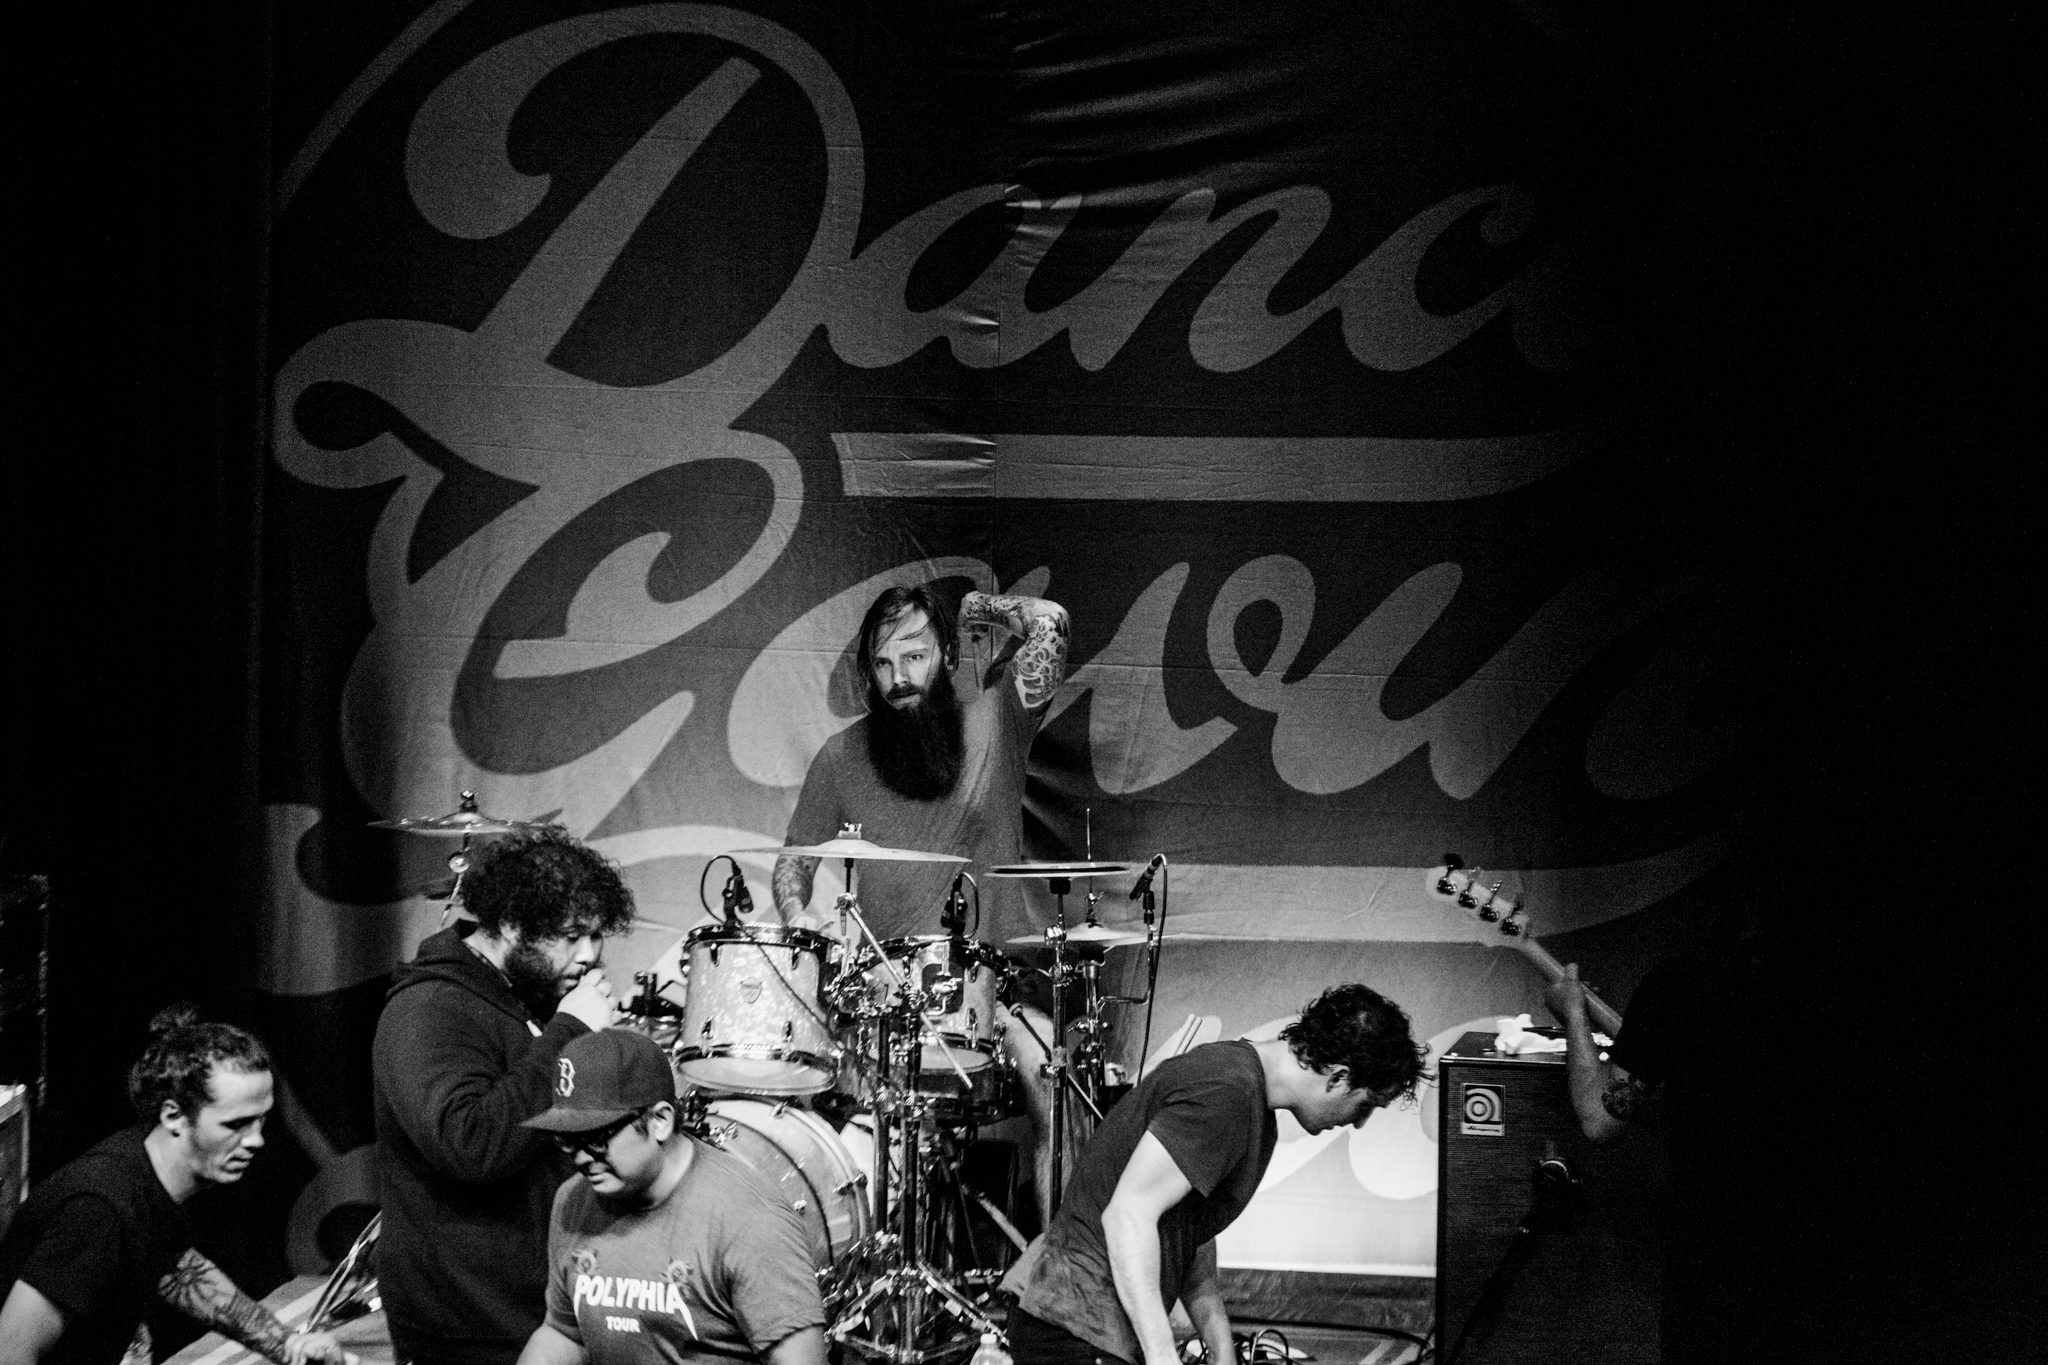 Lafferty Photo - Dance Gavin Dance 03.08.17-8906.jpg